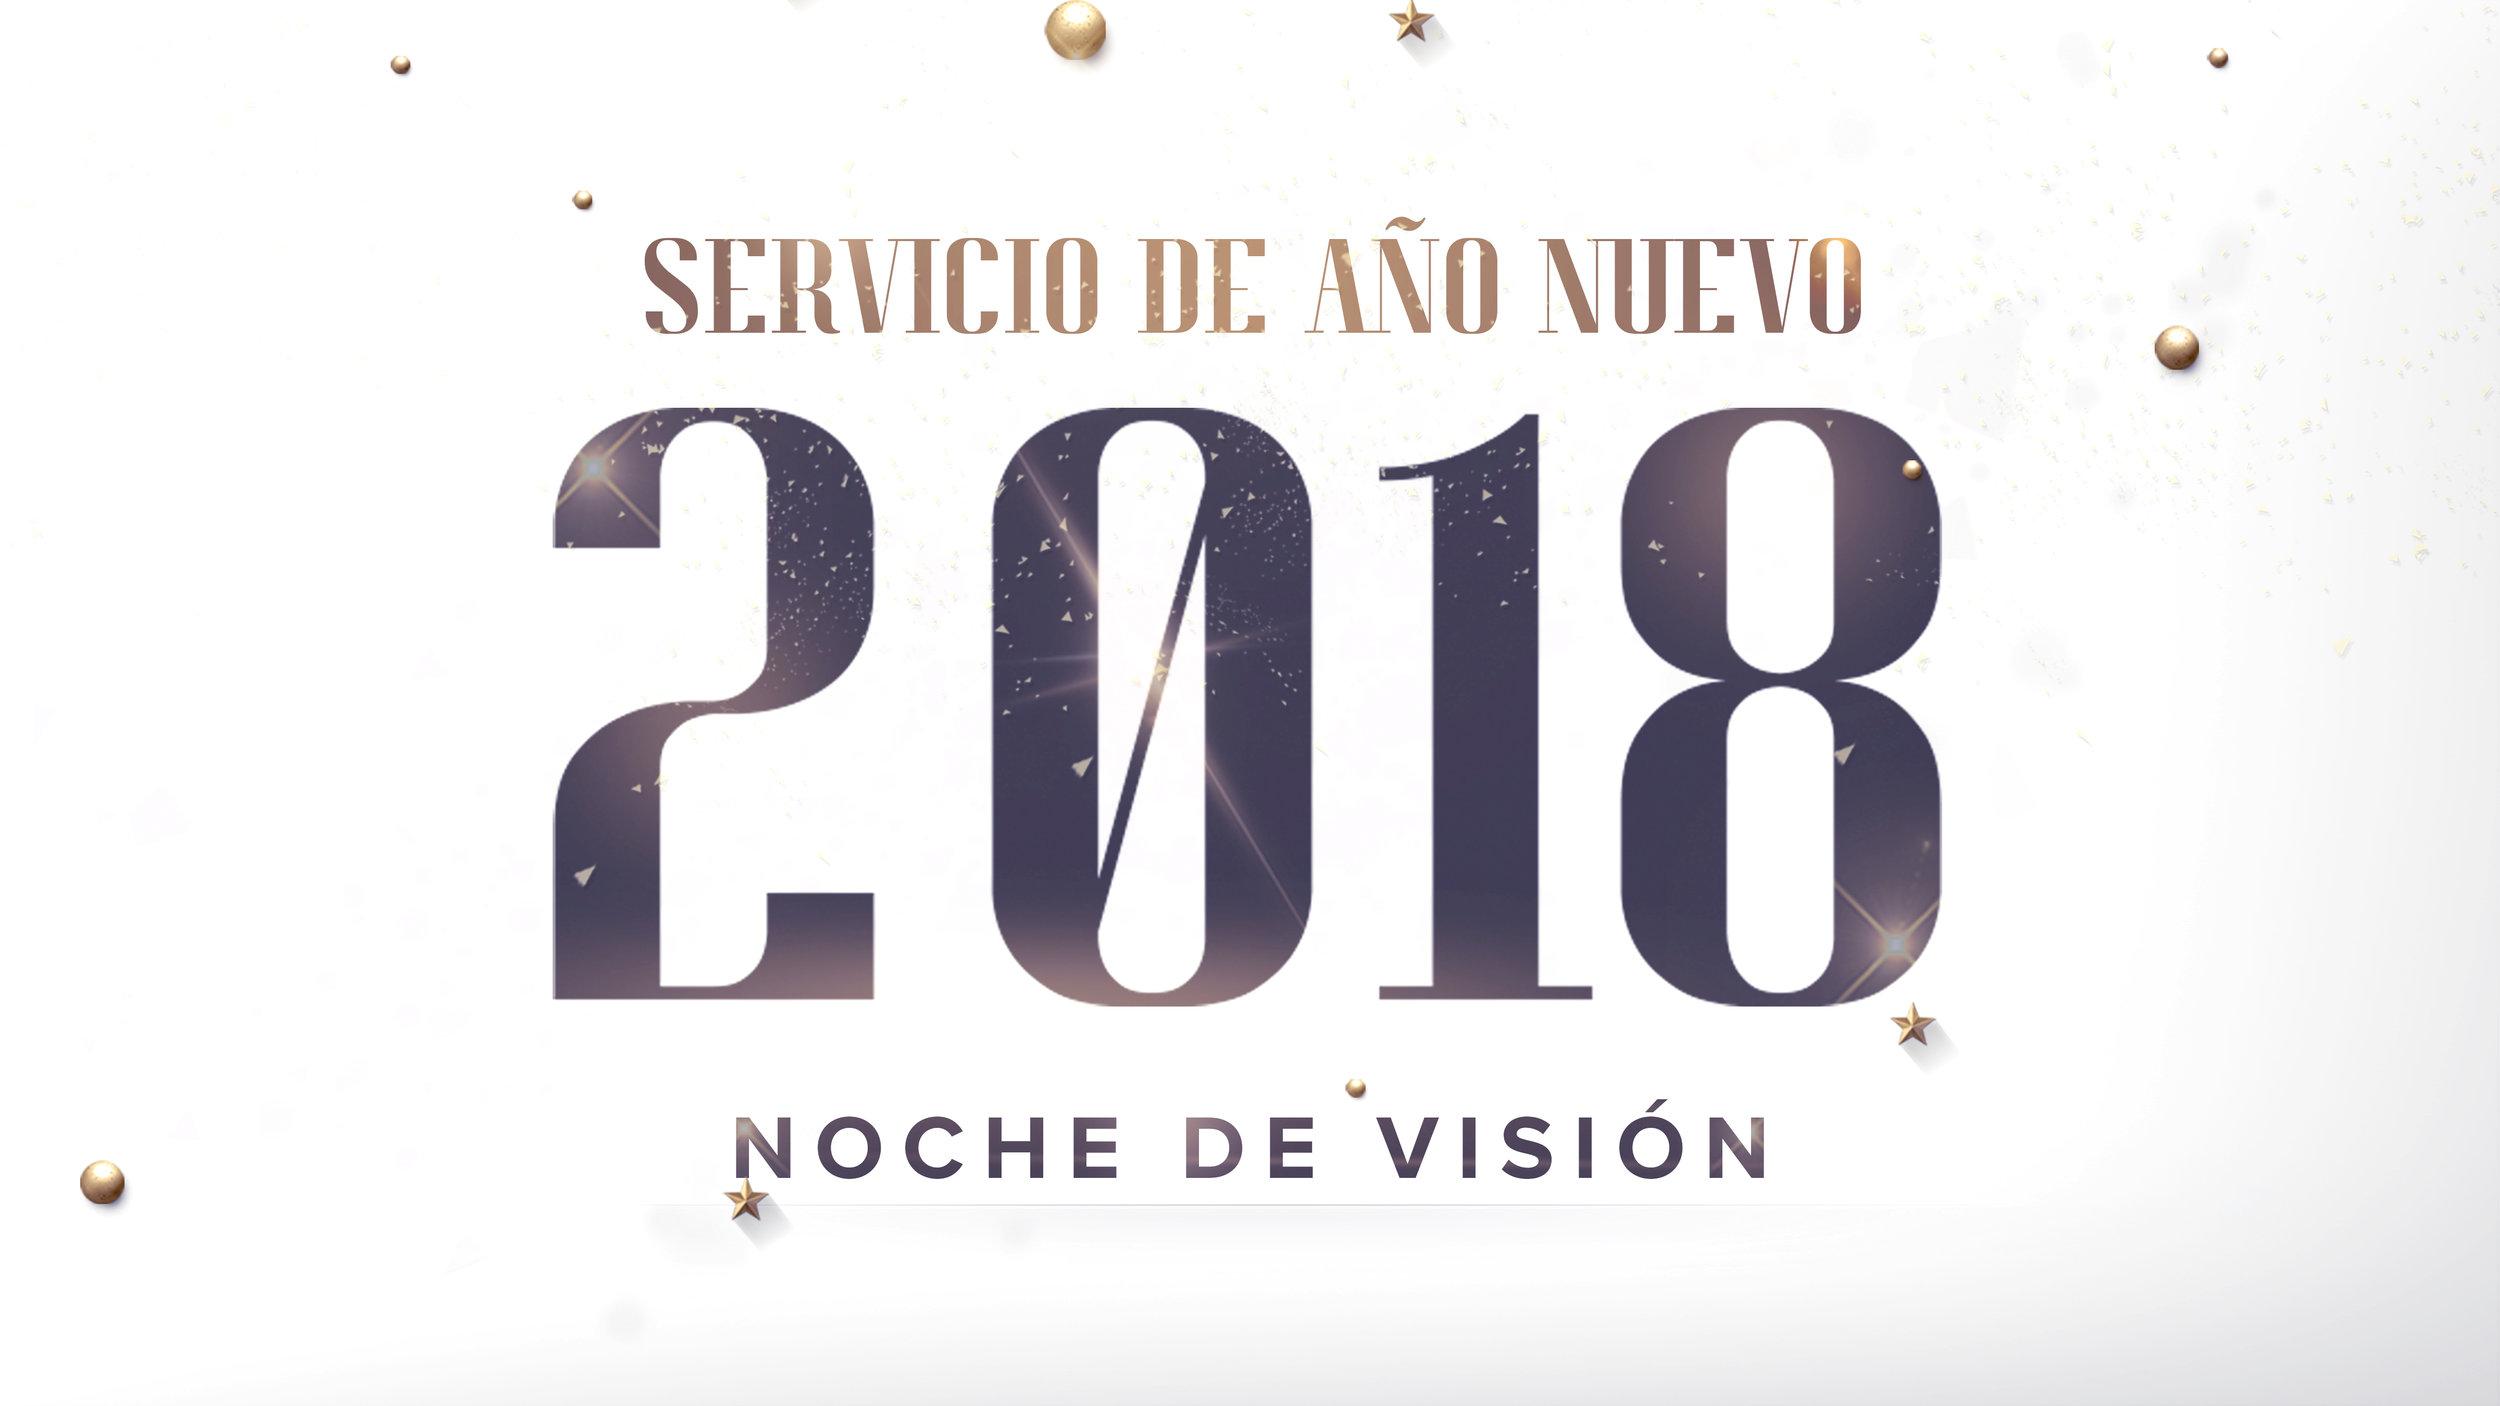 Año nuevo 2018.jpg